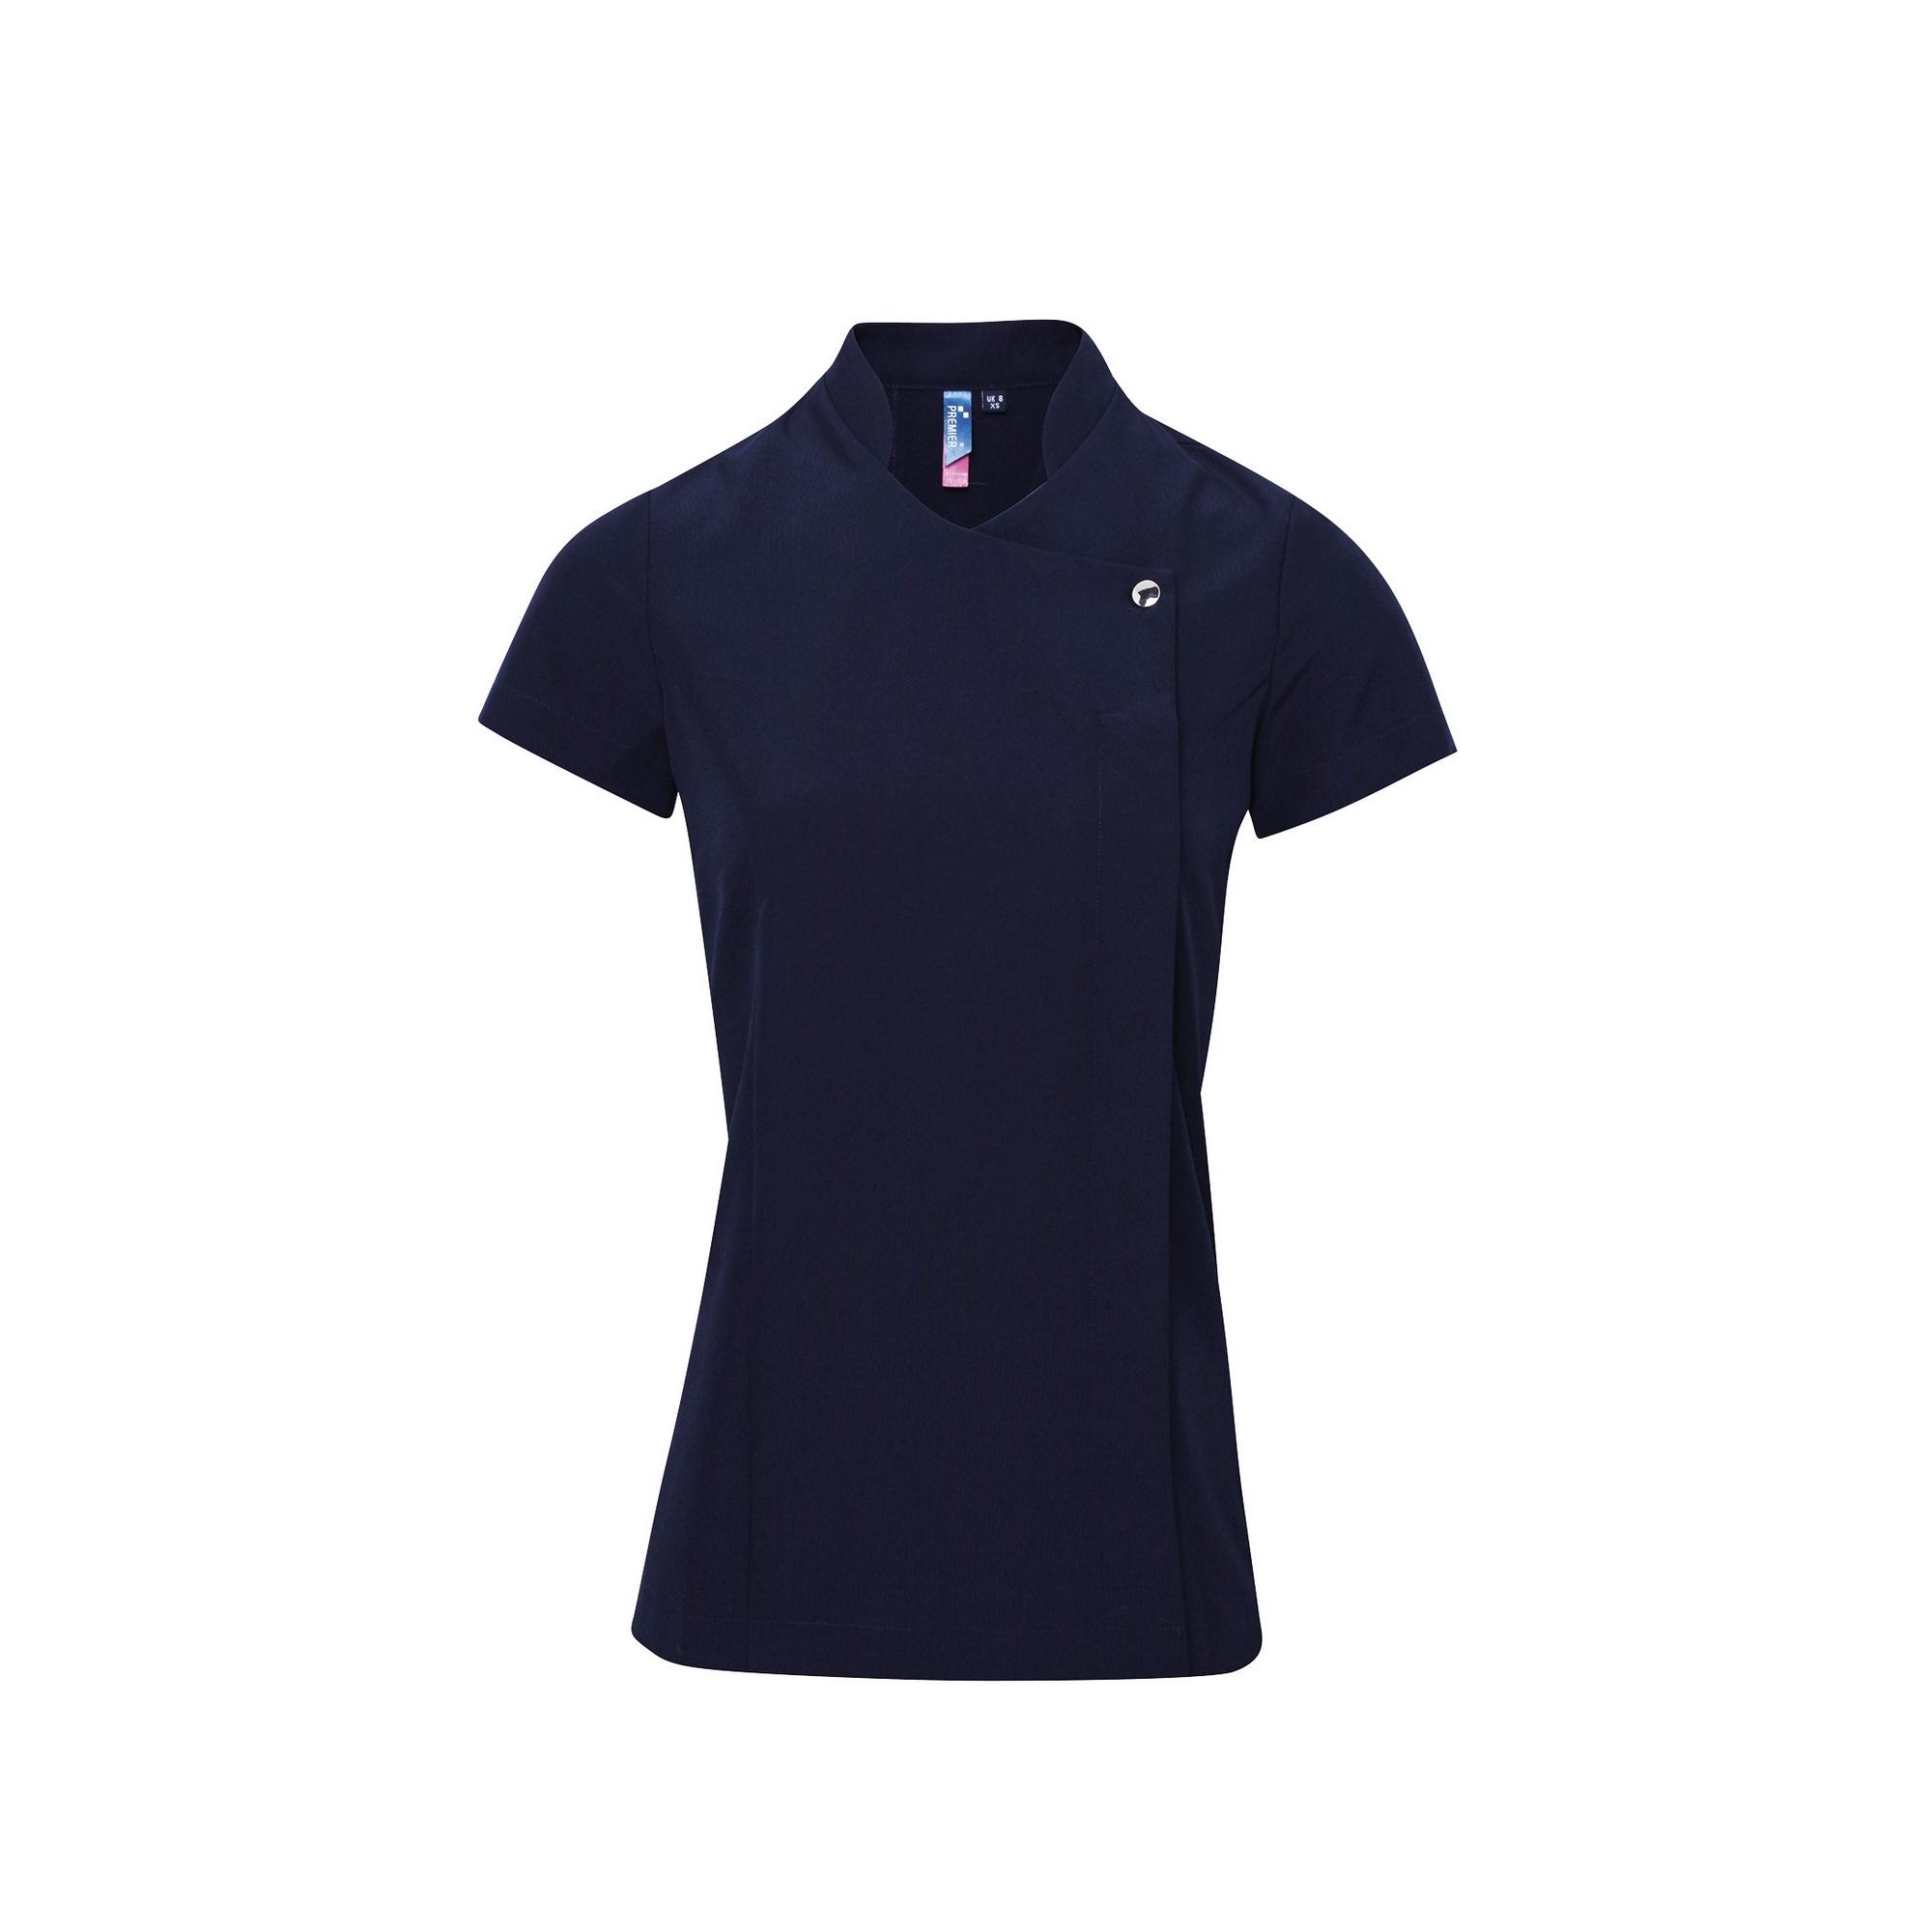 Premier Ladies/Womens *Blossom* Tunic / Health Beauty & Spa / Workwear (16) (Navy)